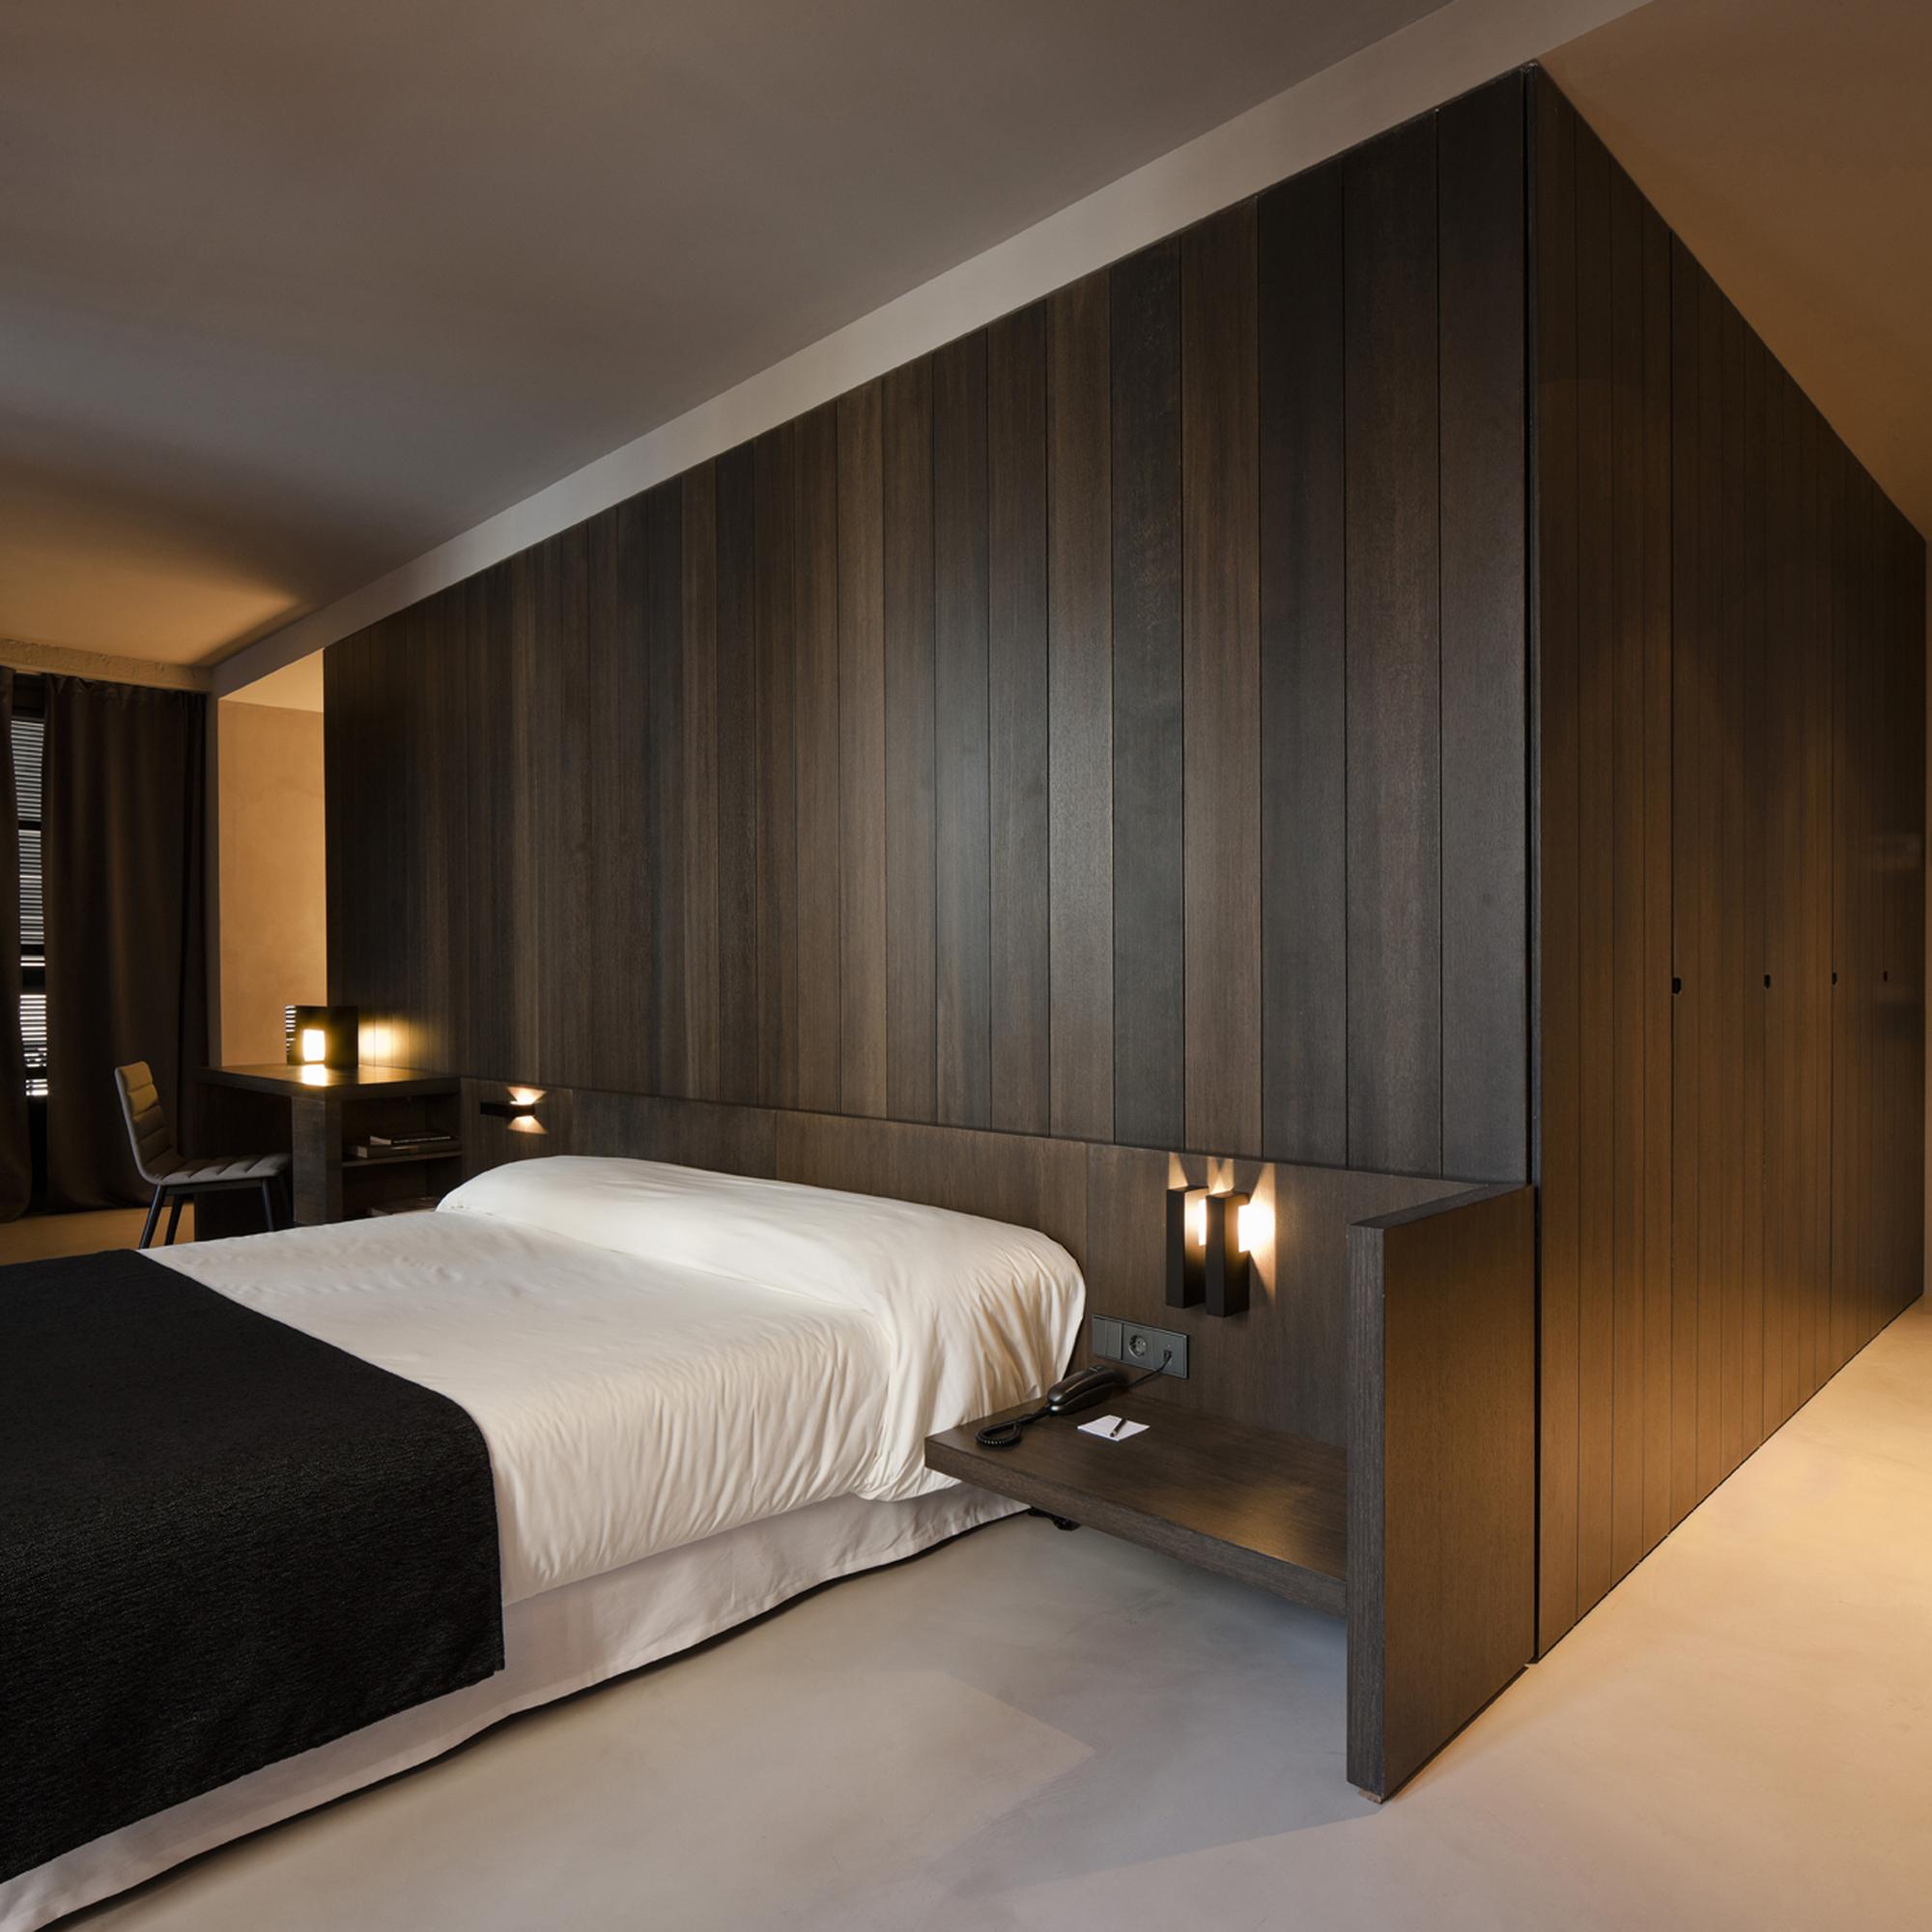 Simple Masculine Bedroom: Gallery Of Caro Hotel / Francesc Rifé Studio